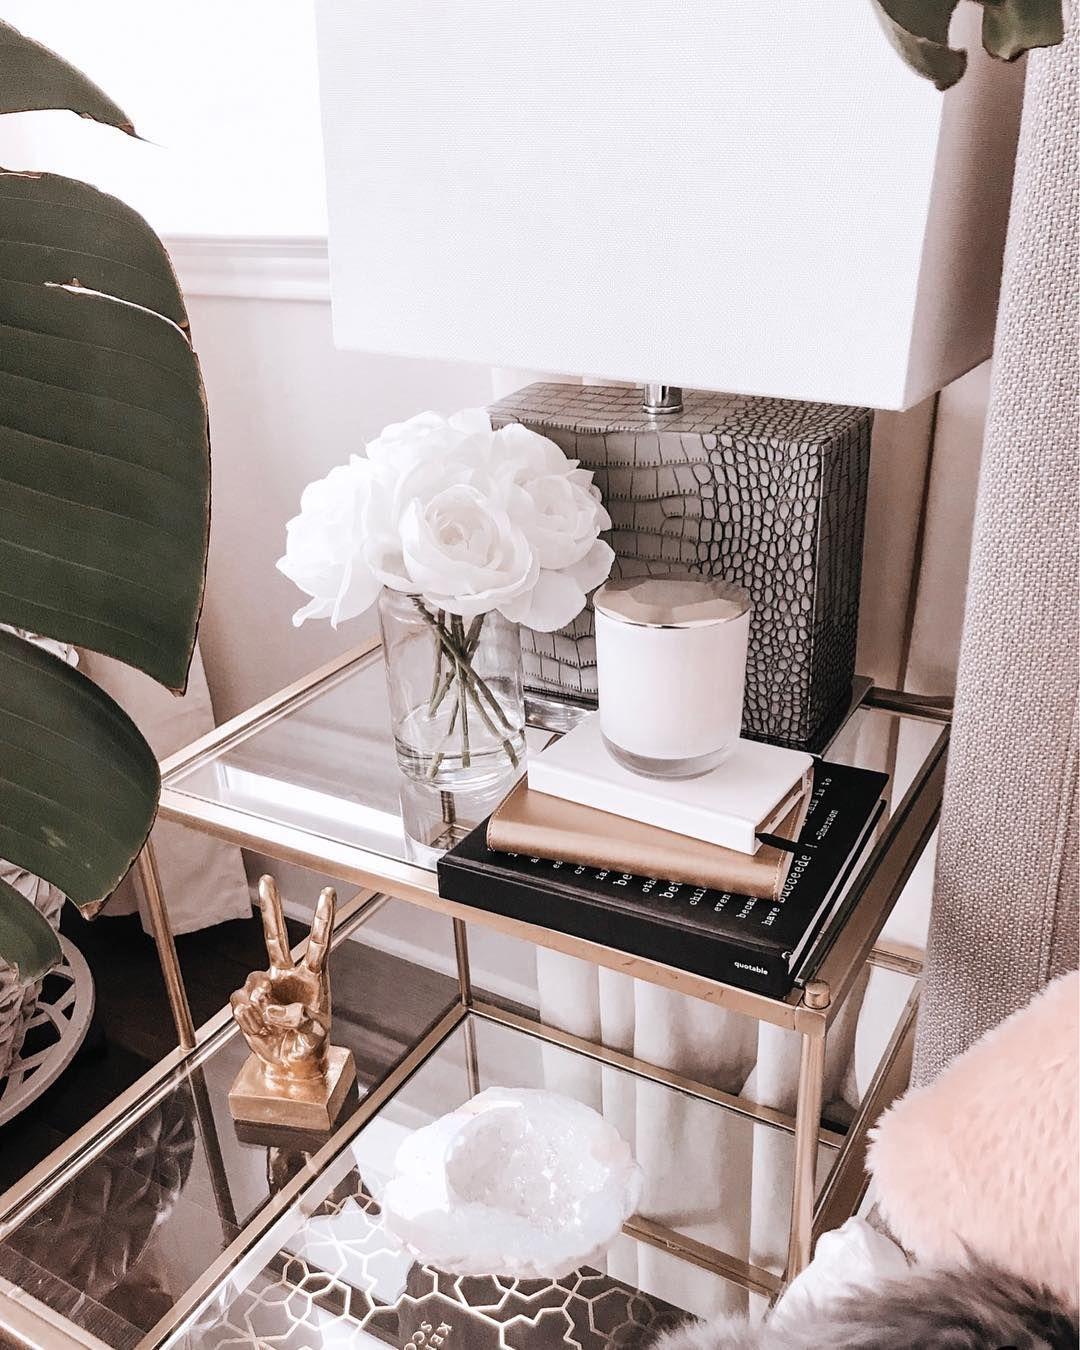 Bedroom Inspo Bedroom Table Side Table Night Table Nightstand